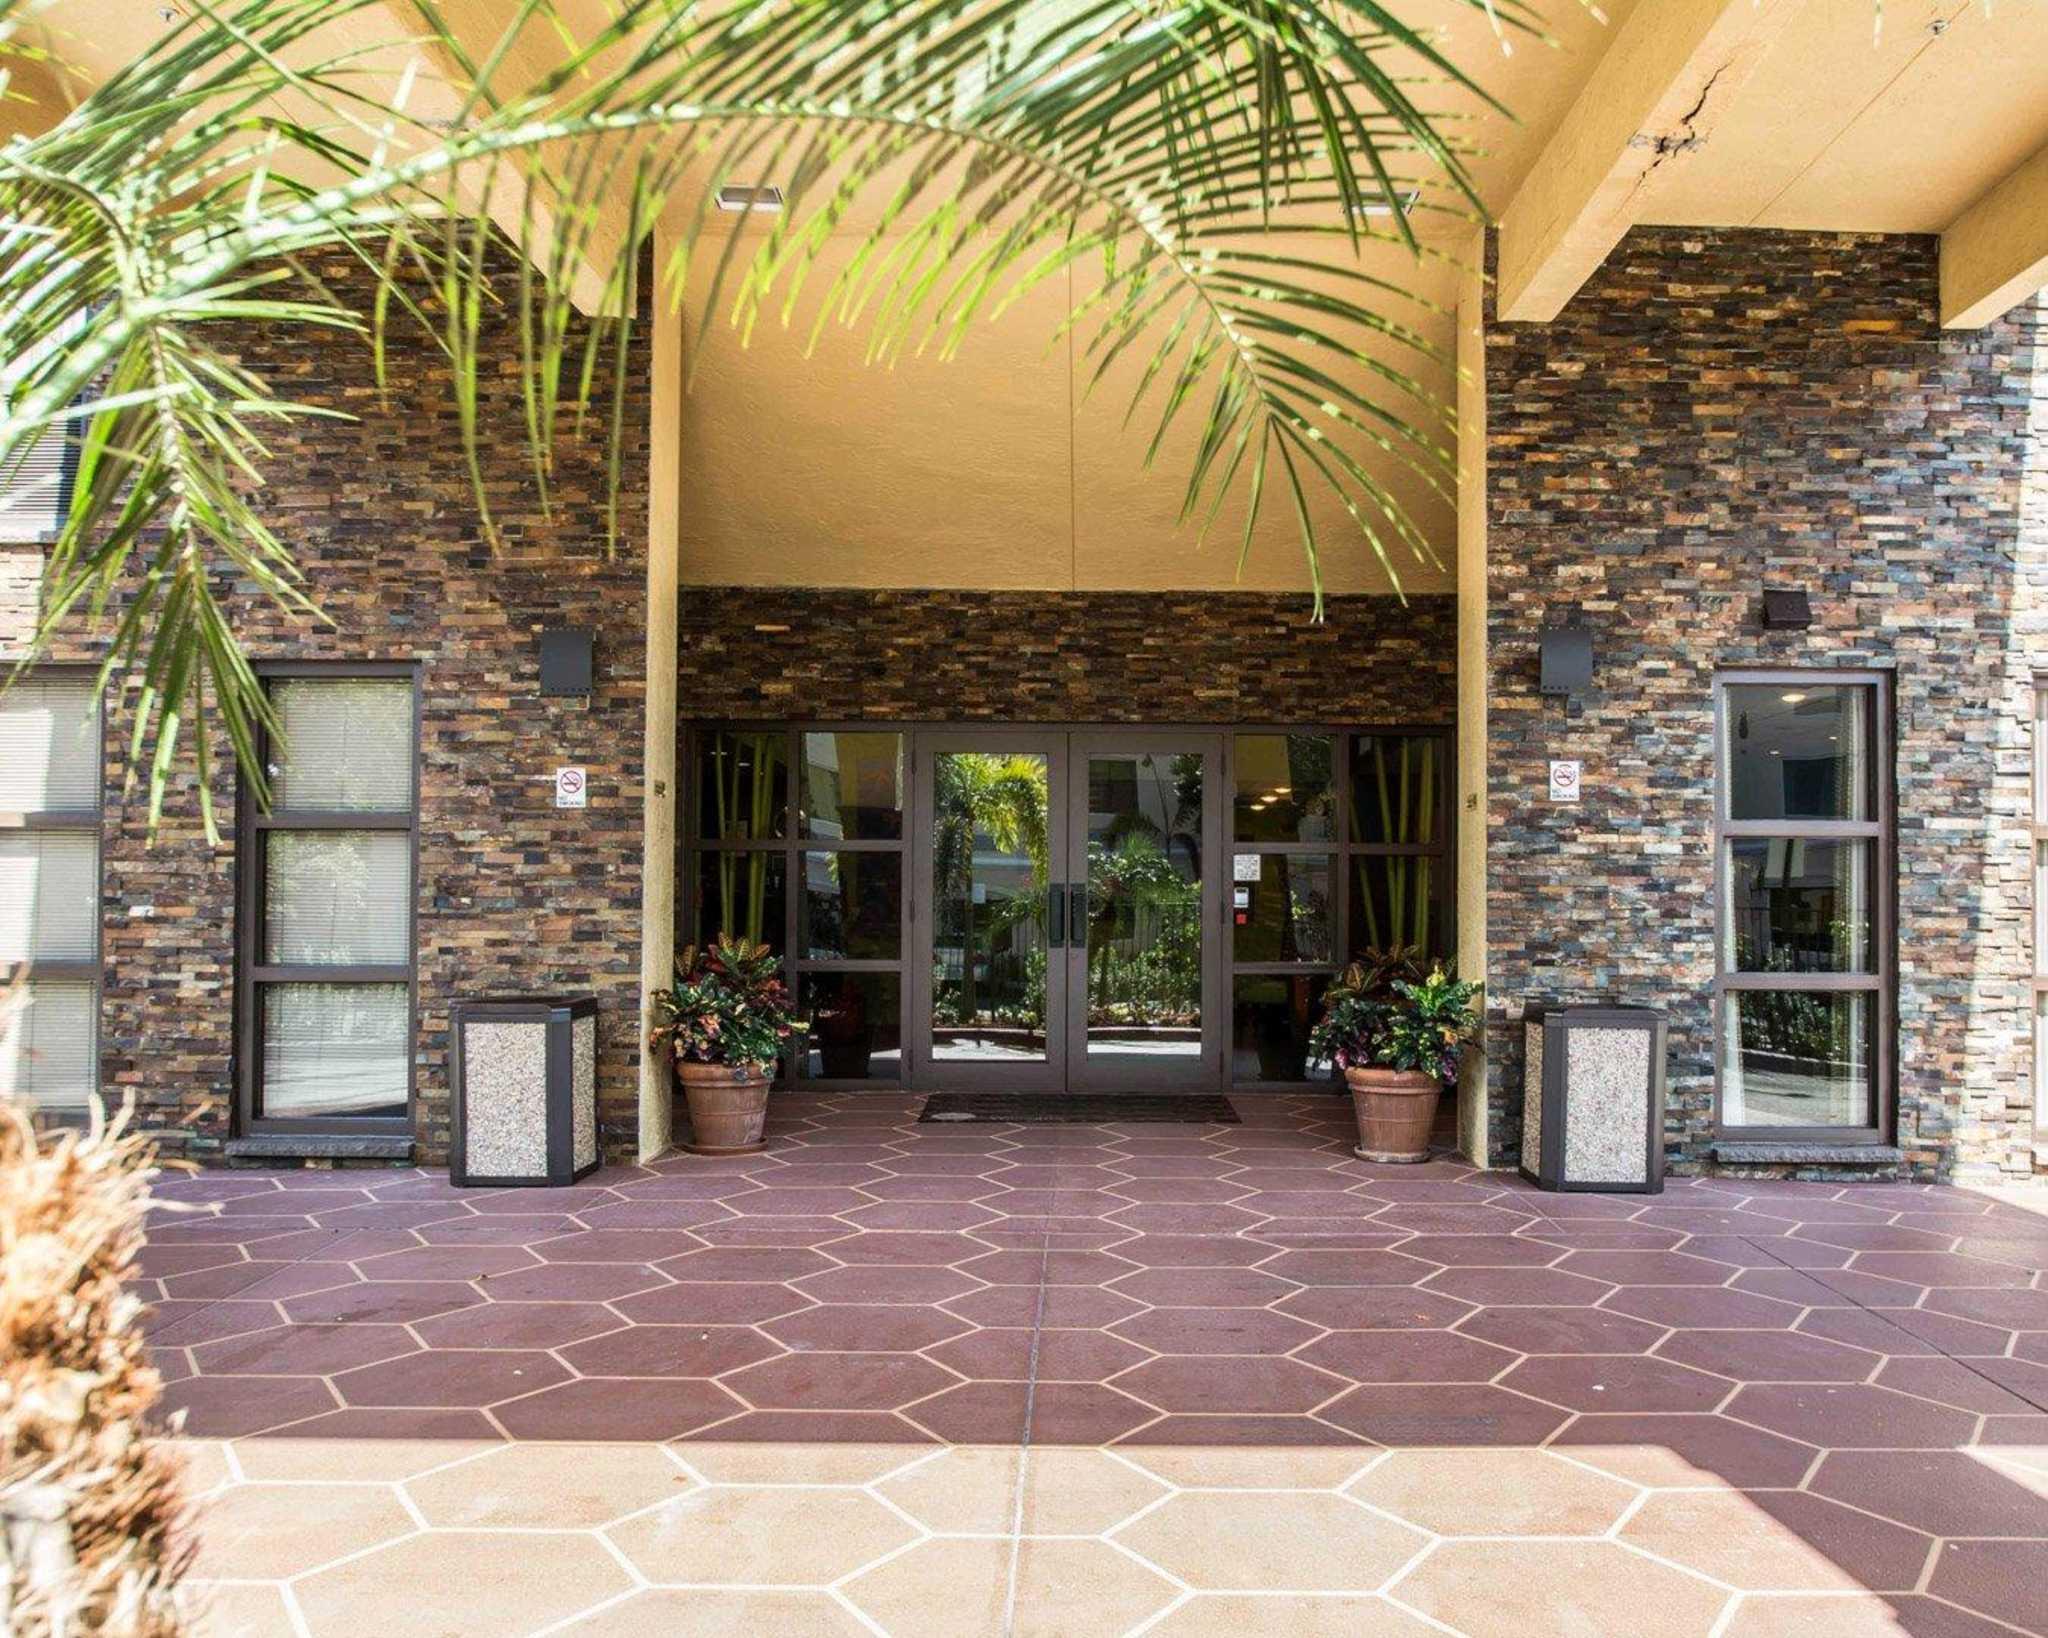 Comfort Inn & Suites Lantana - West Palm Beach South image 3